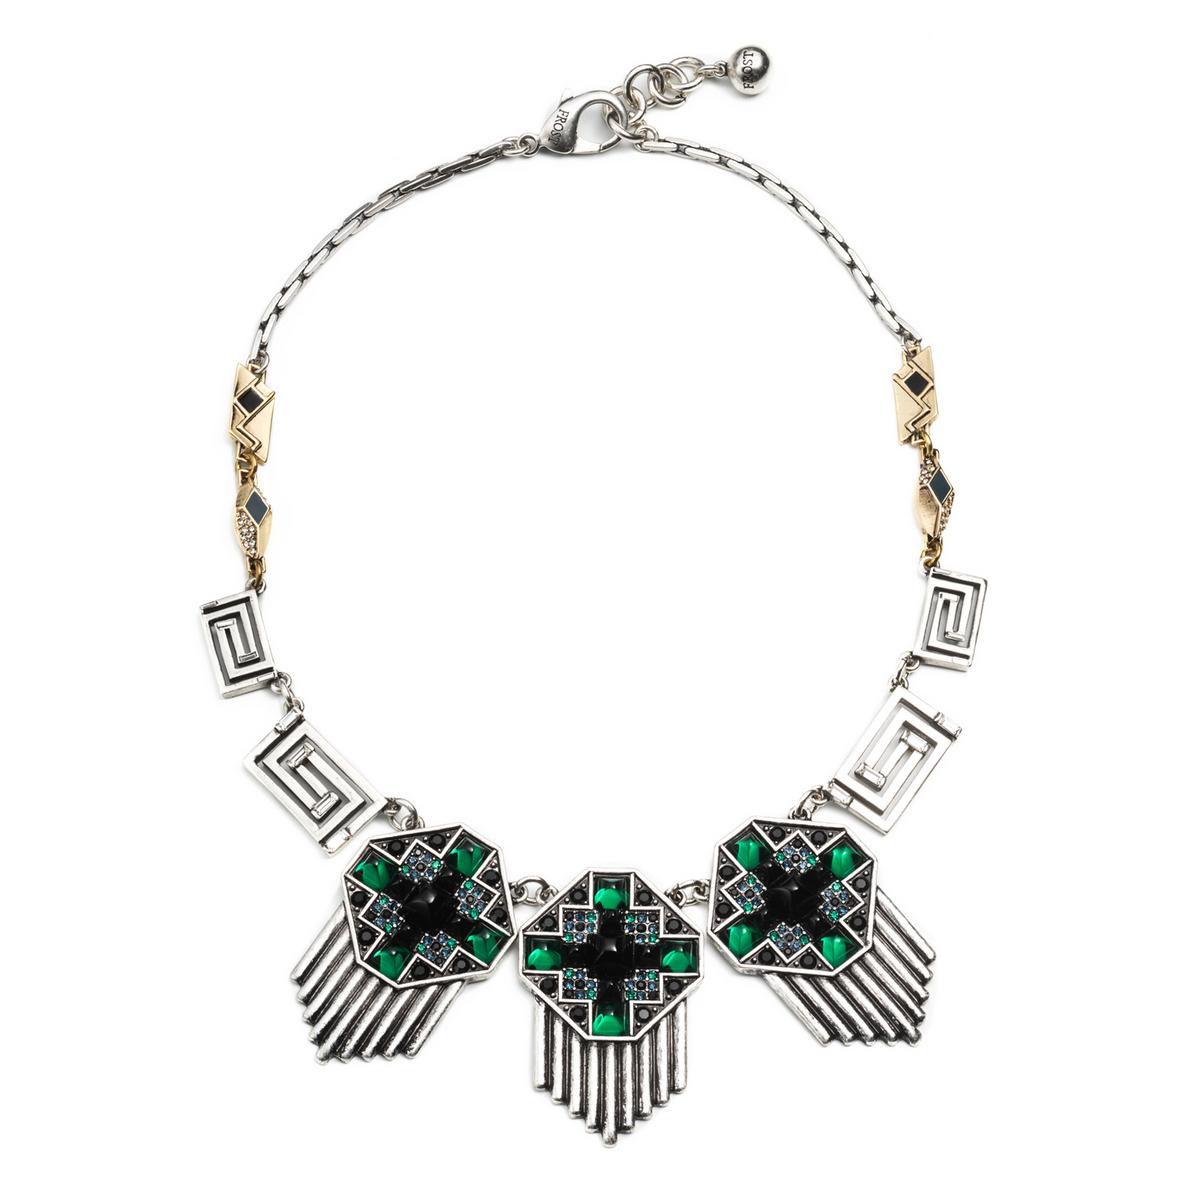 lulu vaulted necklace in metallic lyst